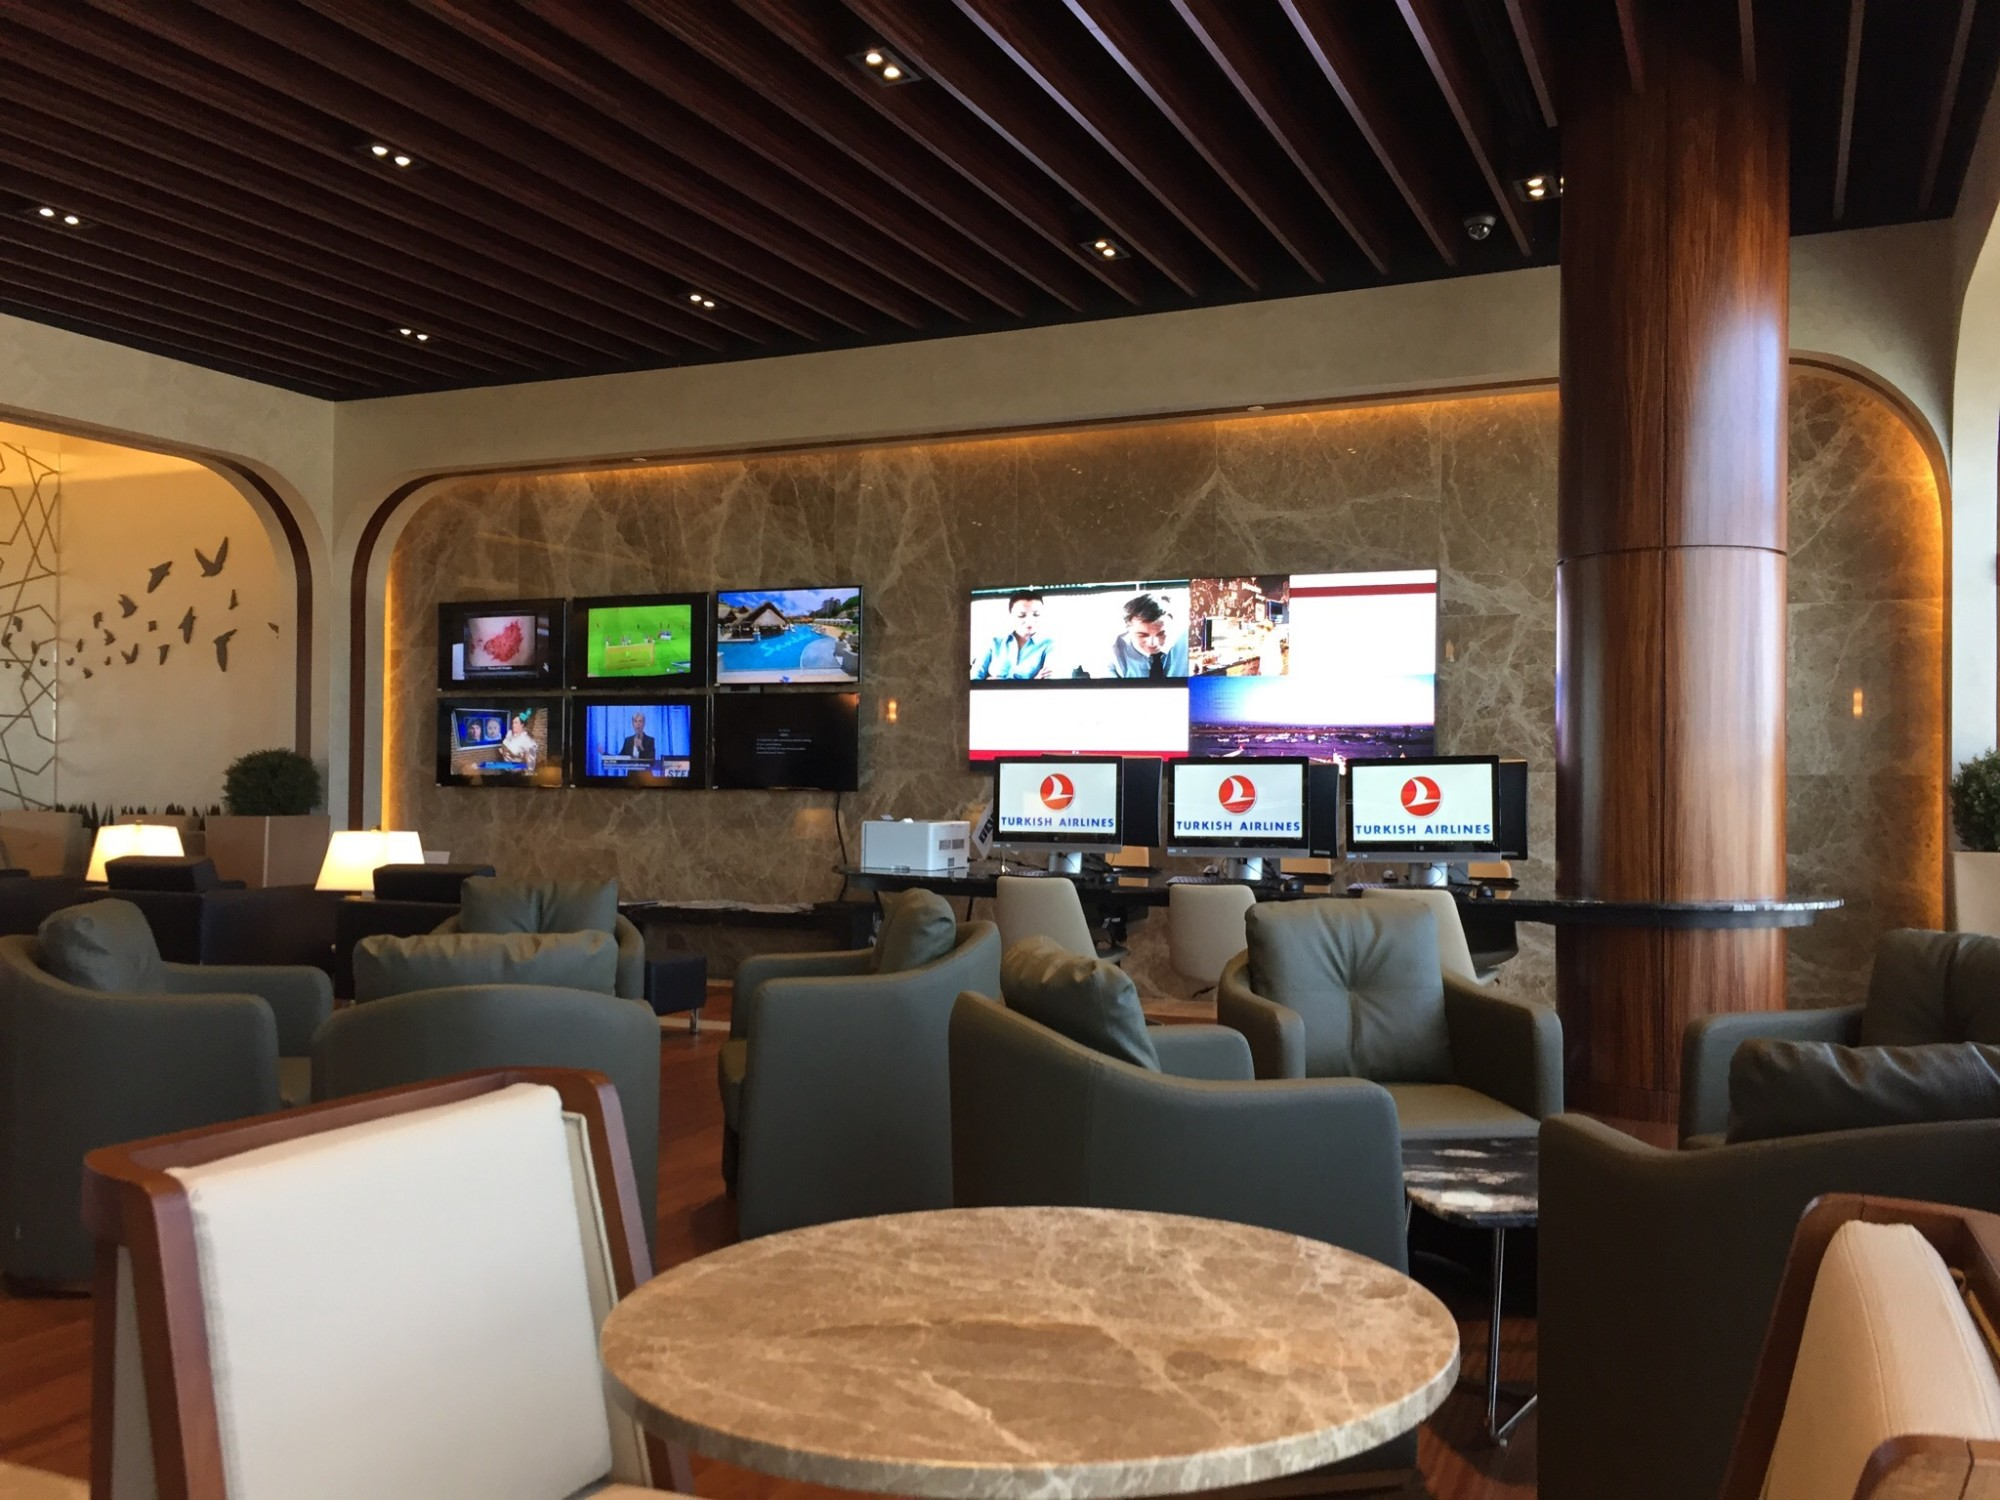 Washington Dulles turkish airlines lounge ile ilgili görsel sonucu